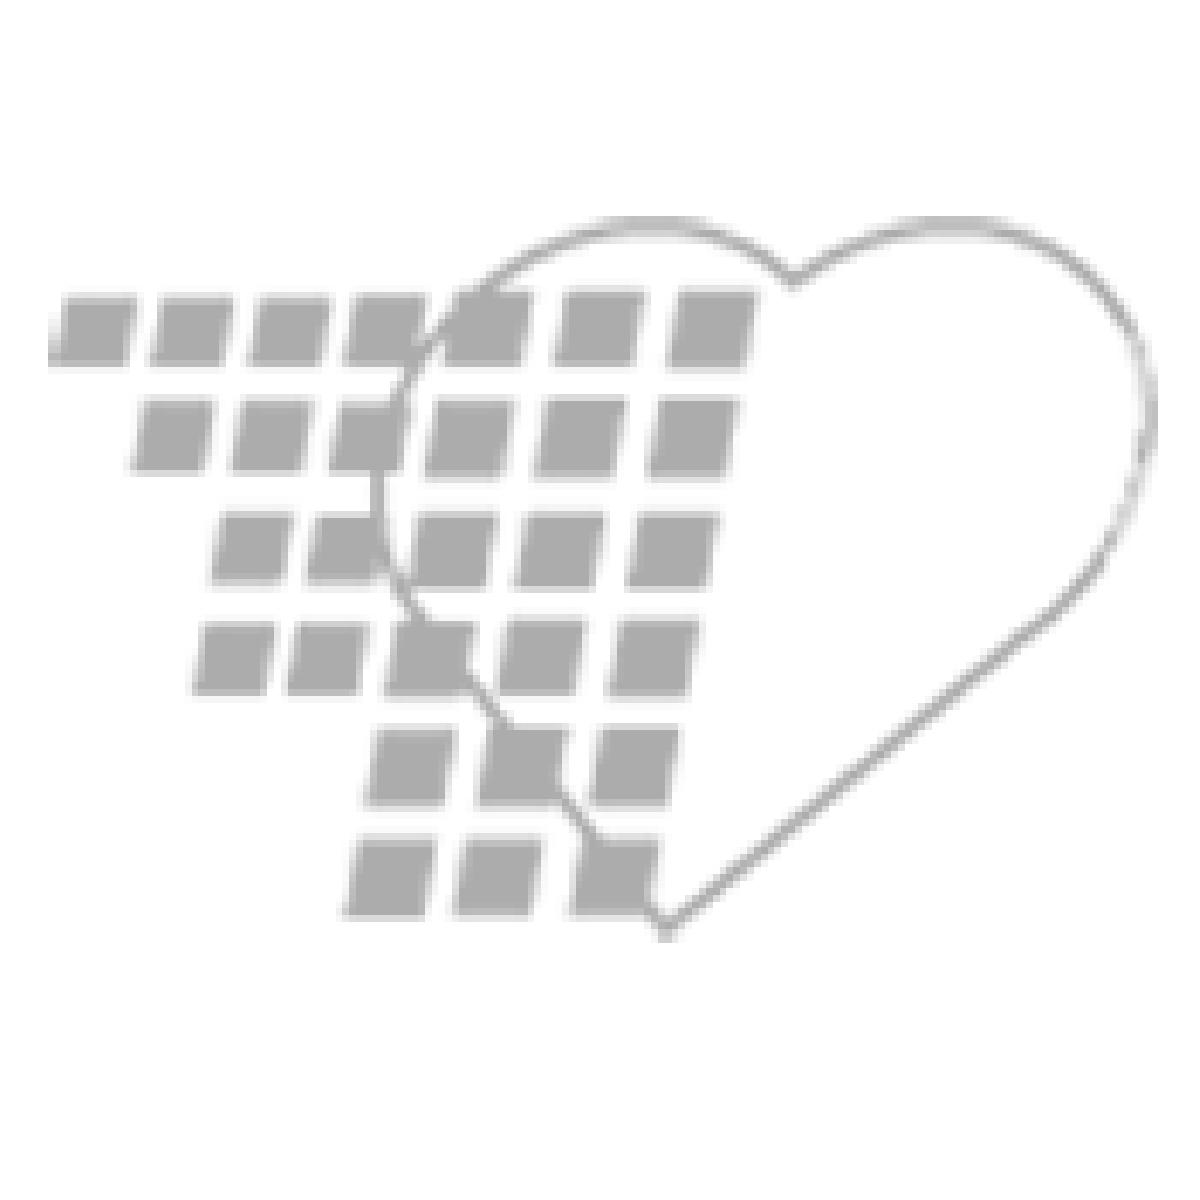 02-70-4080-CHLD - Laryngoscope Miller Blade #2